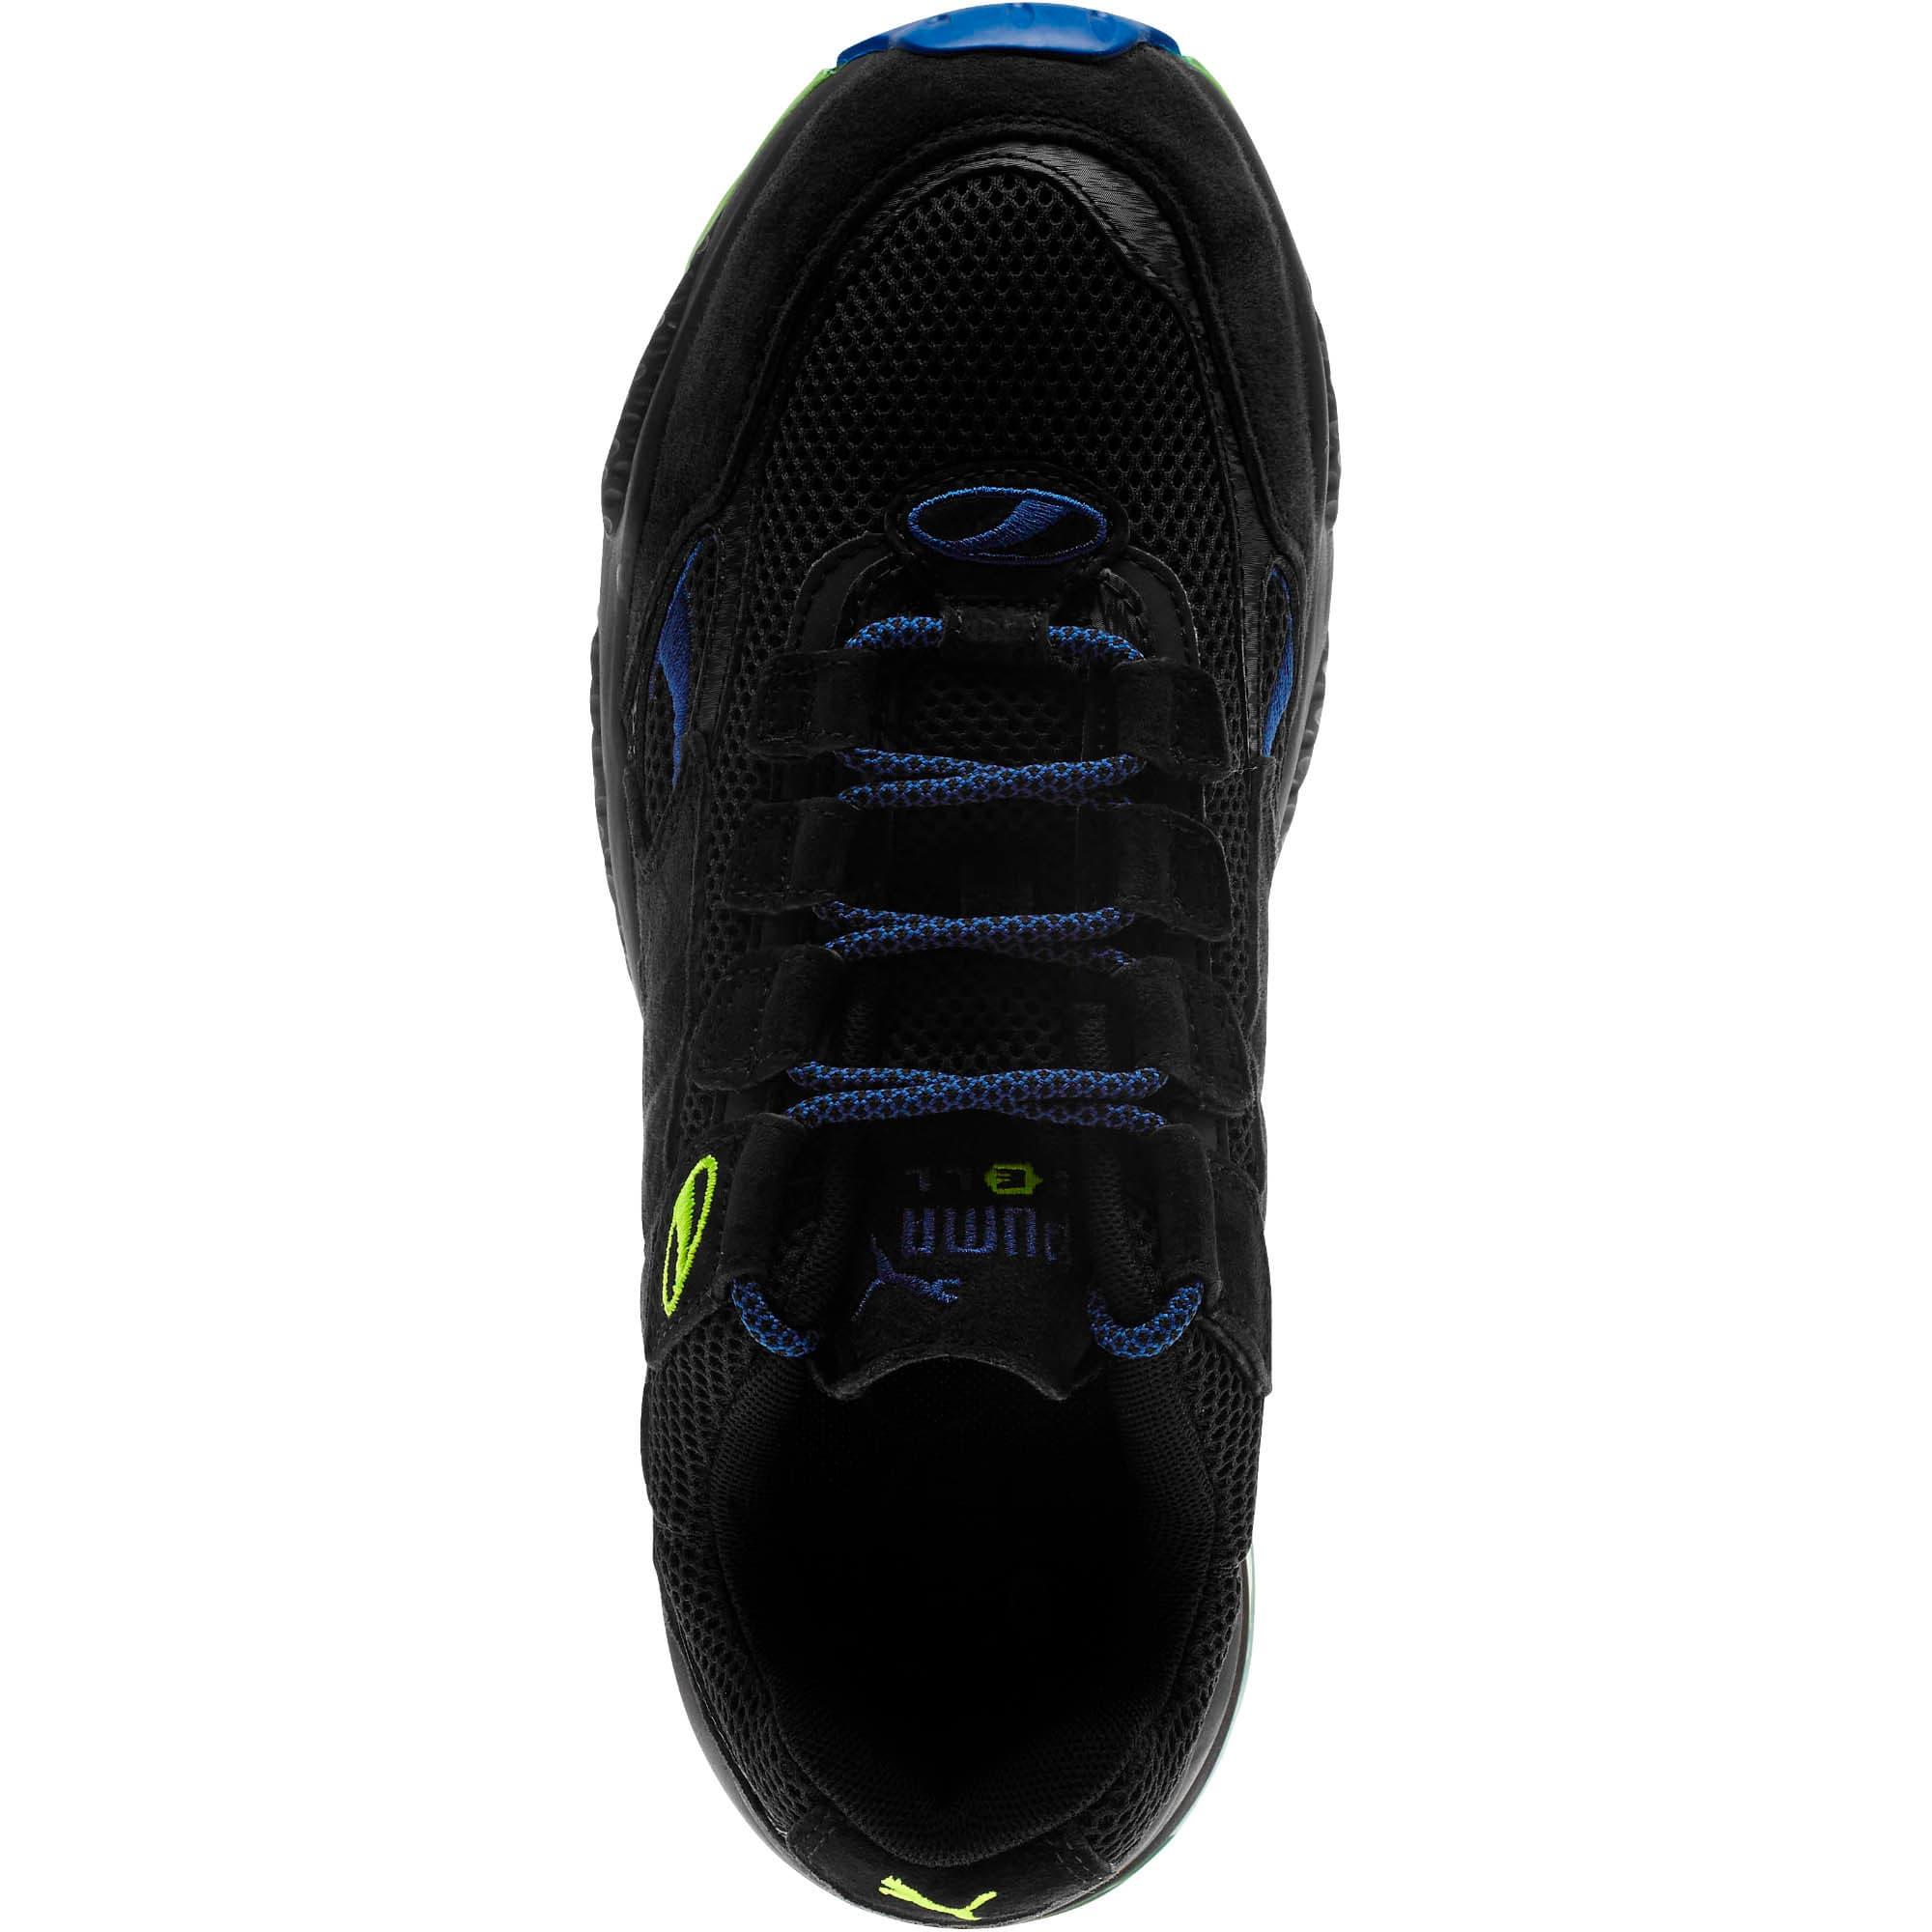 Thumbnail 5 of CELL Venom NV Sneakers, Puma Black-Surf The Web, medium